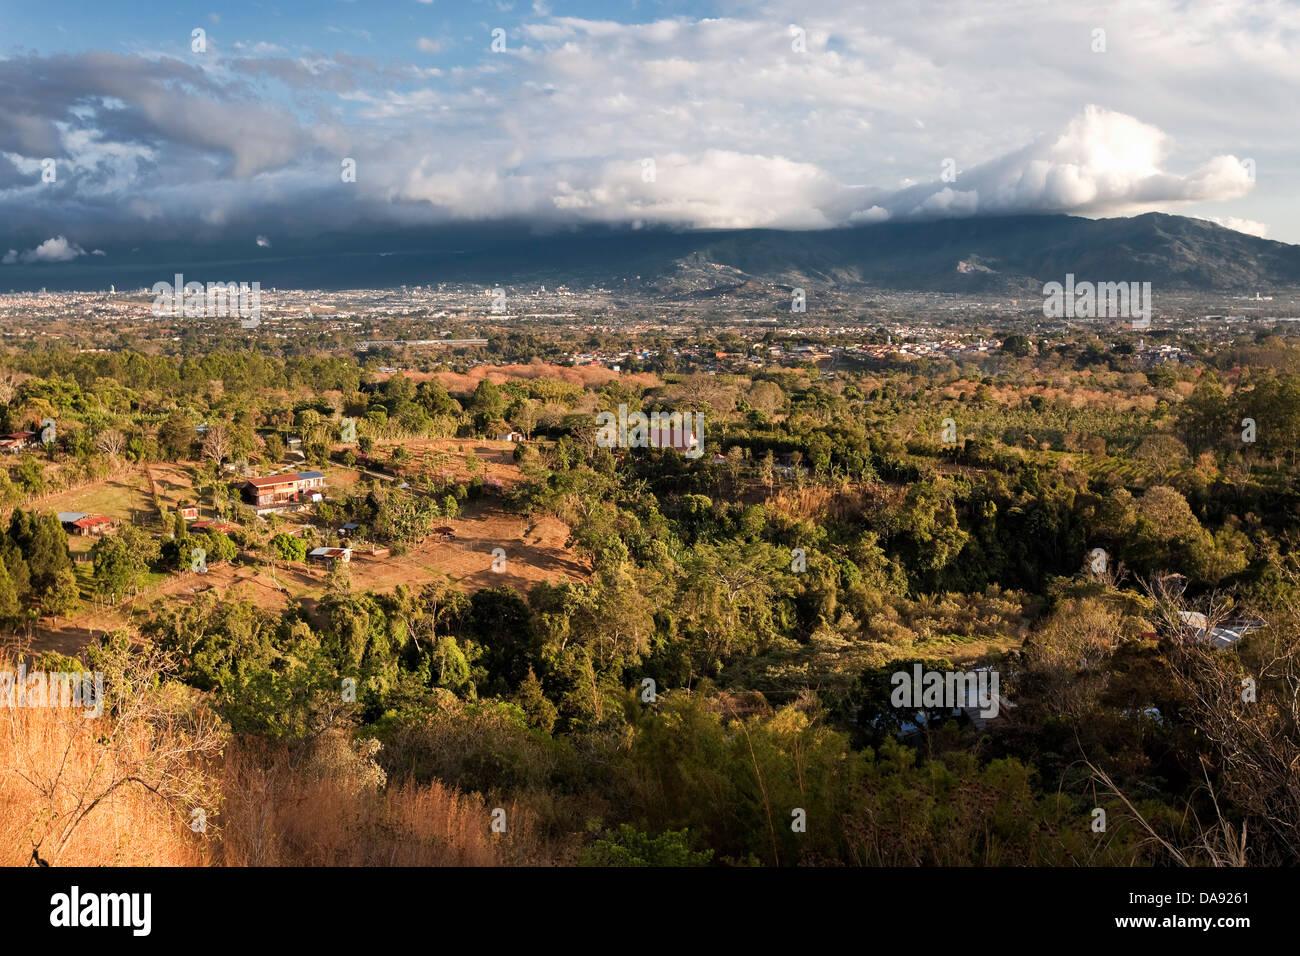 Vallée de San Jose, Costa Rica Photo Stock